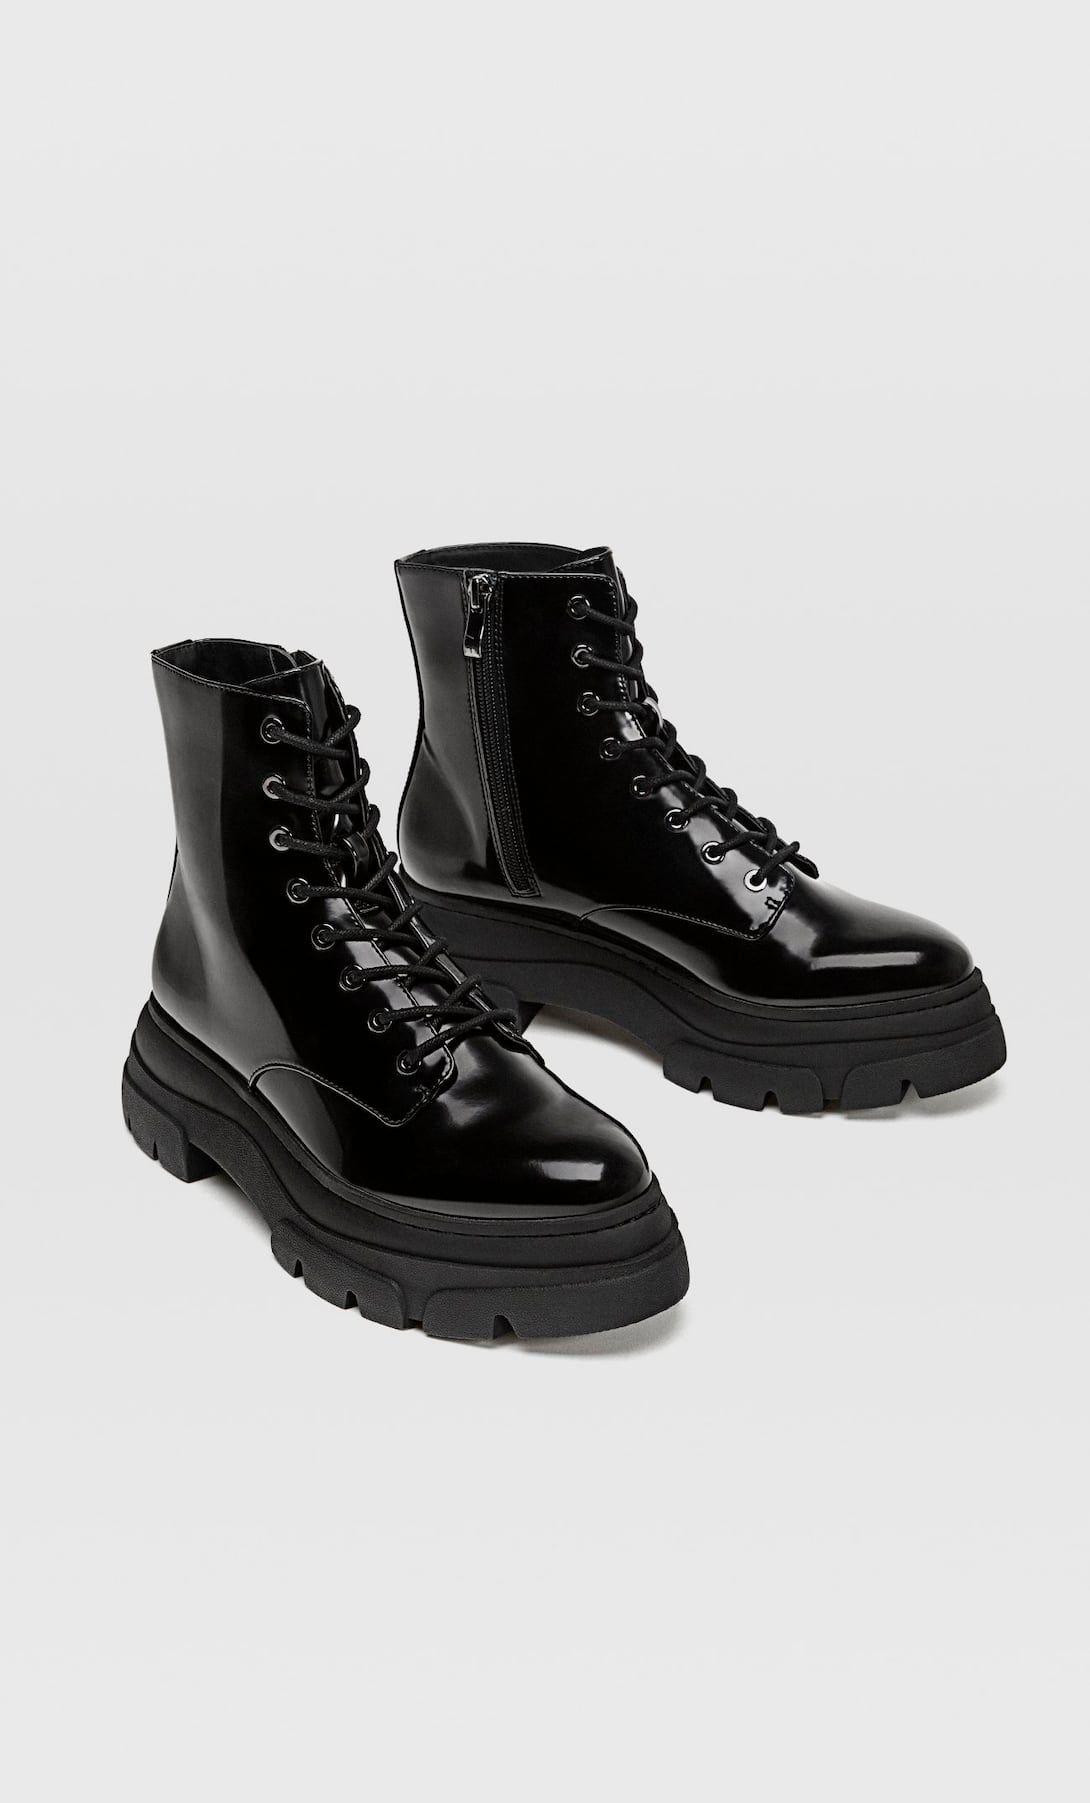 10 botas militares low cost